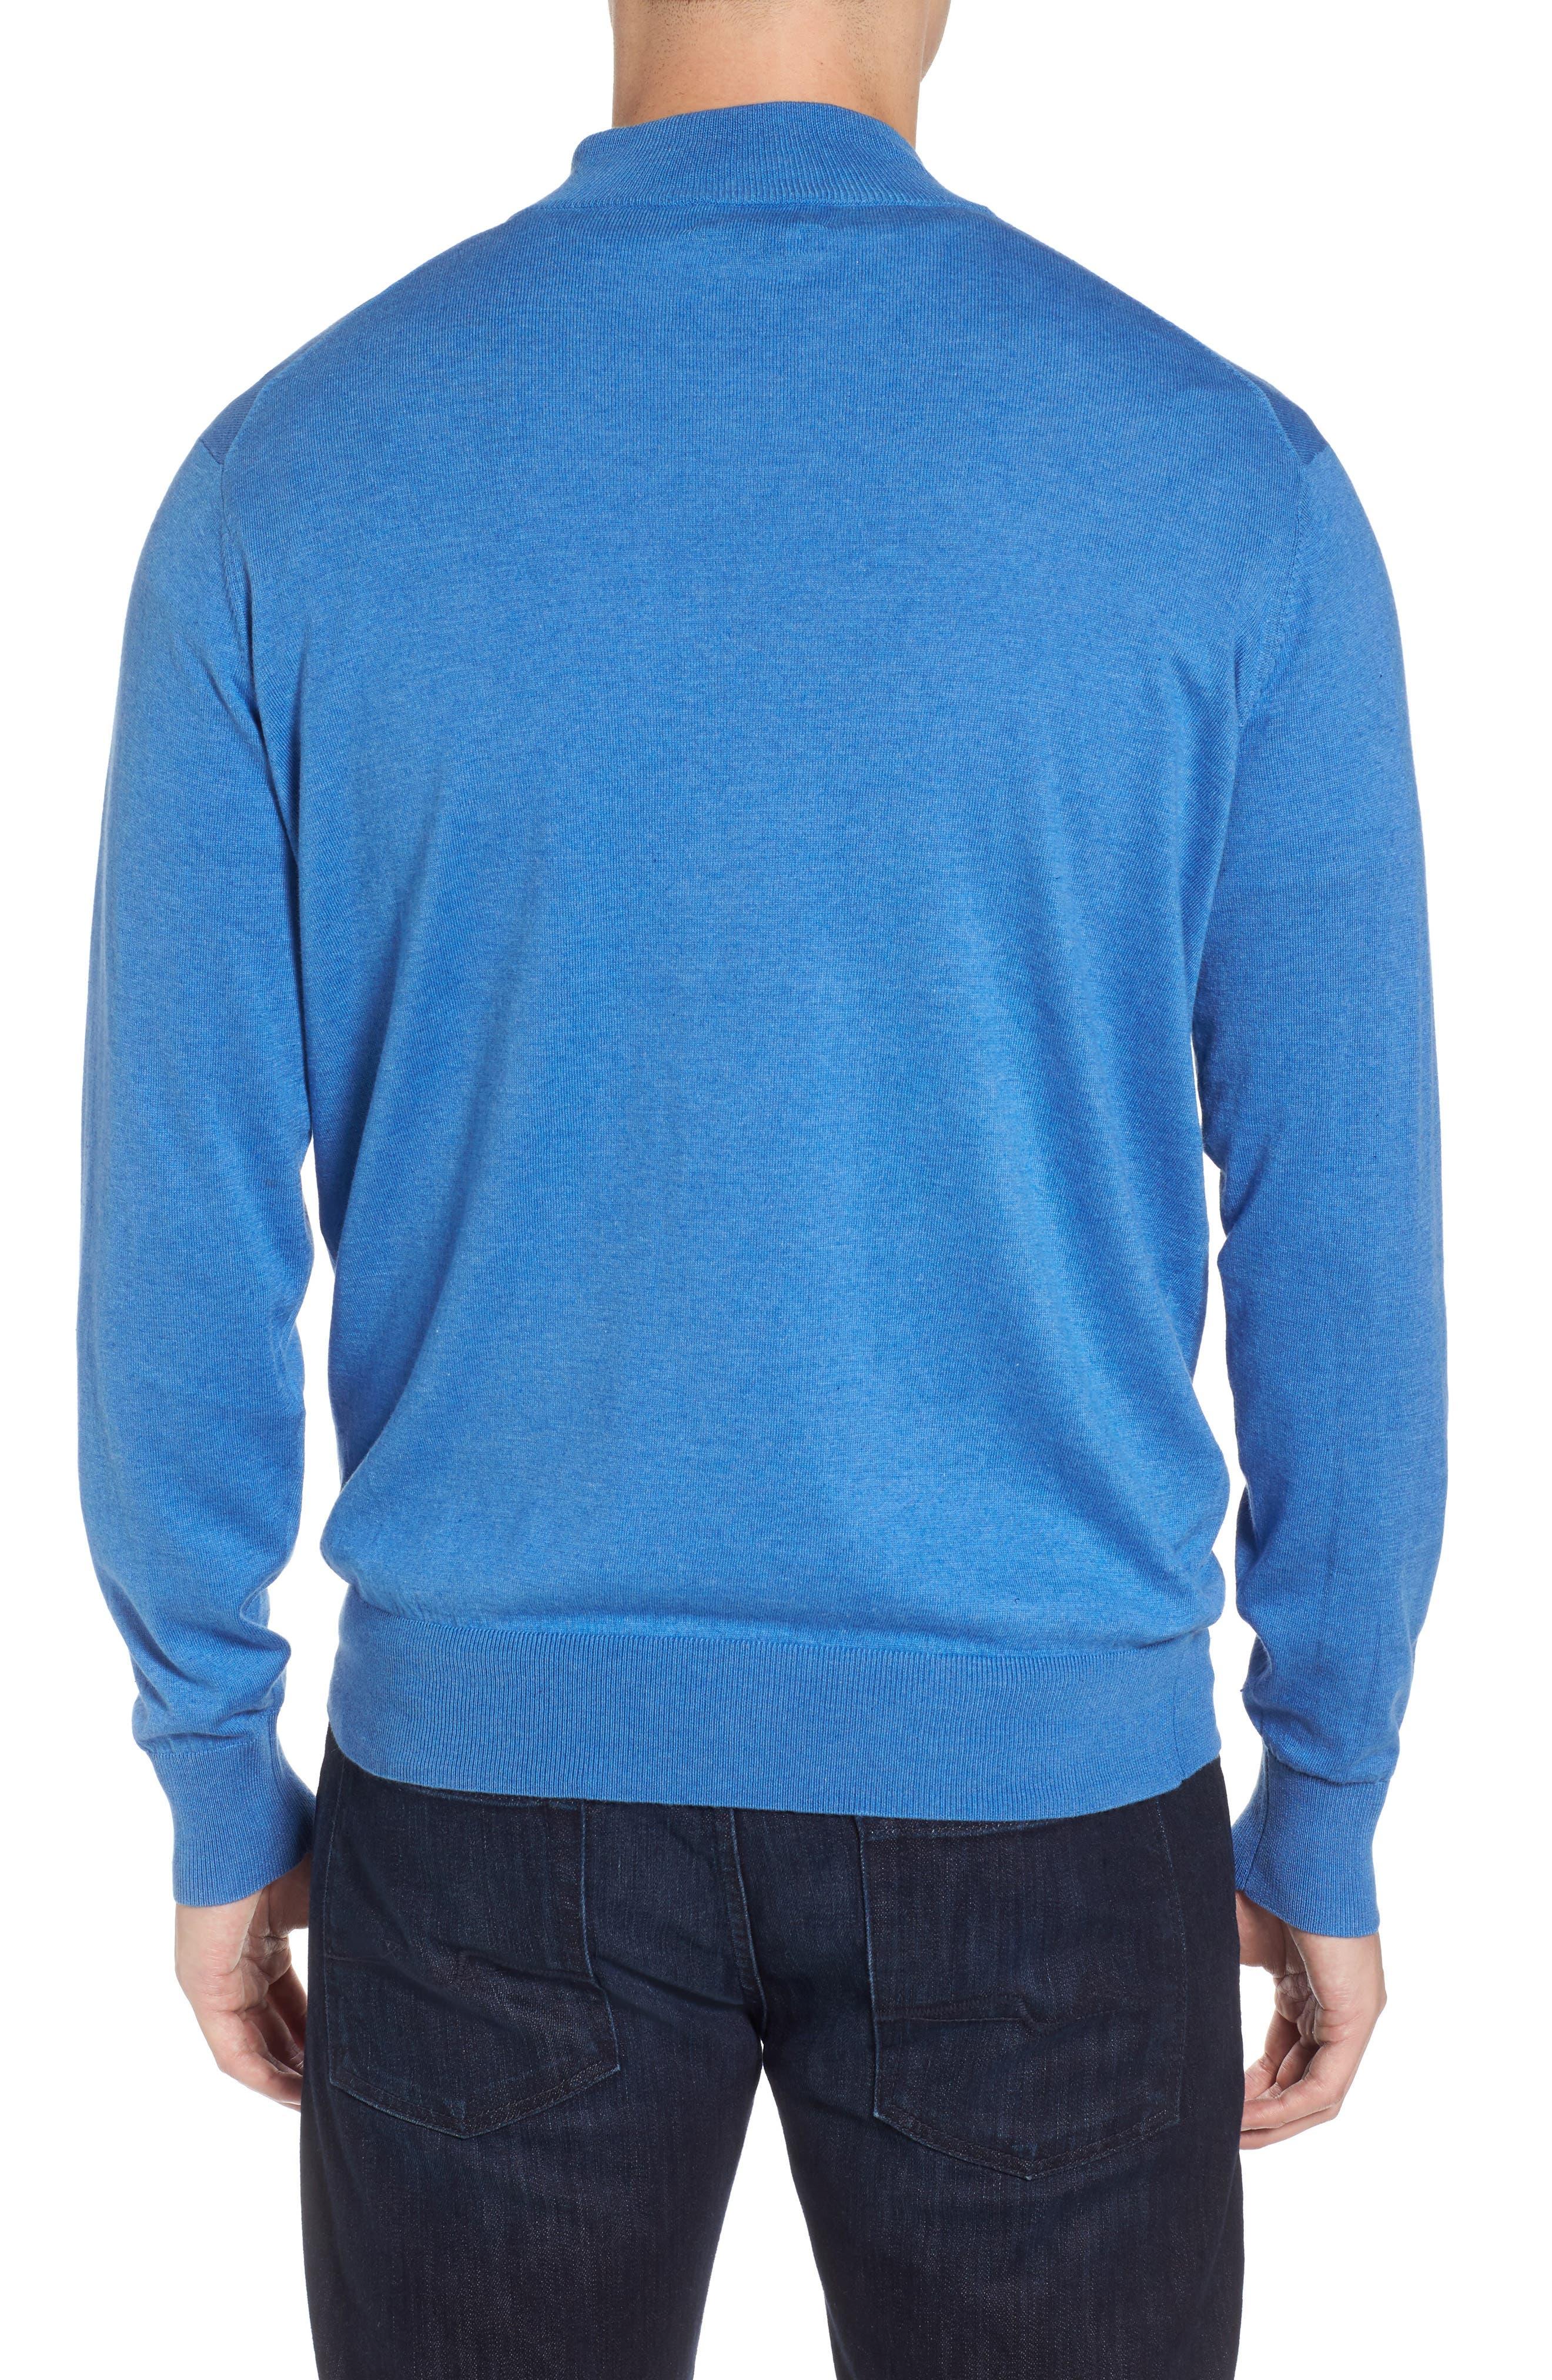 Crown Soft Quarter-Zip Pullover,                             Alternate thumbnail 2, color,                             Boardwalk Blue